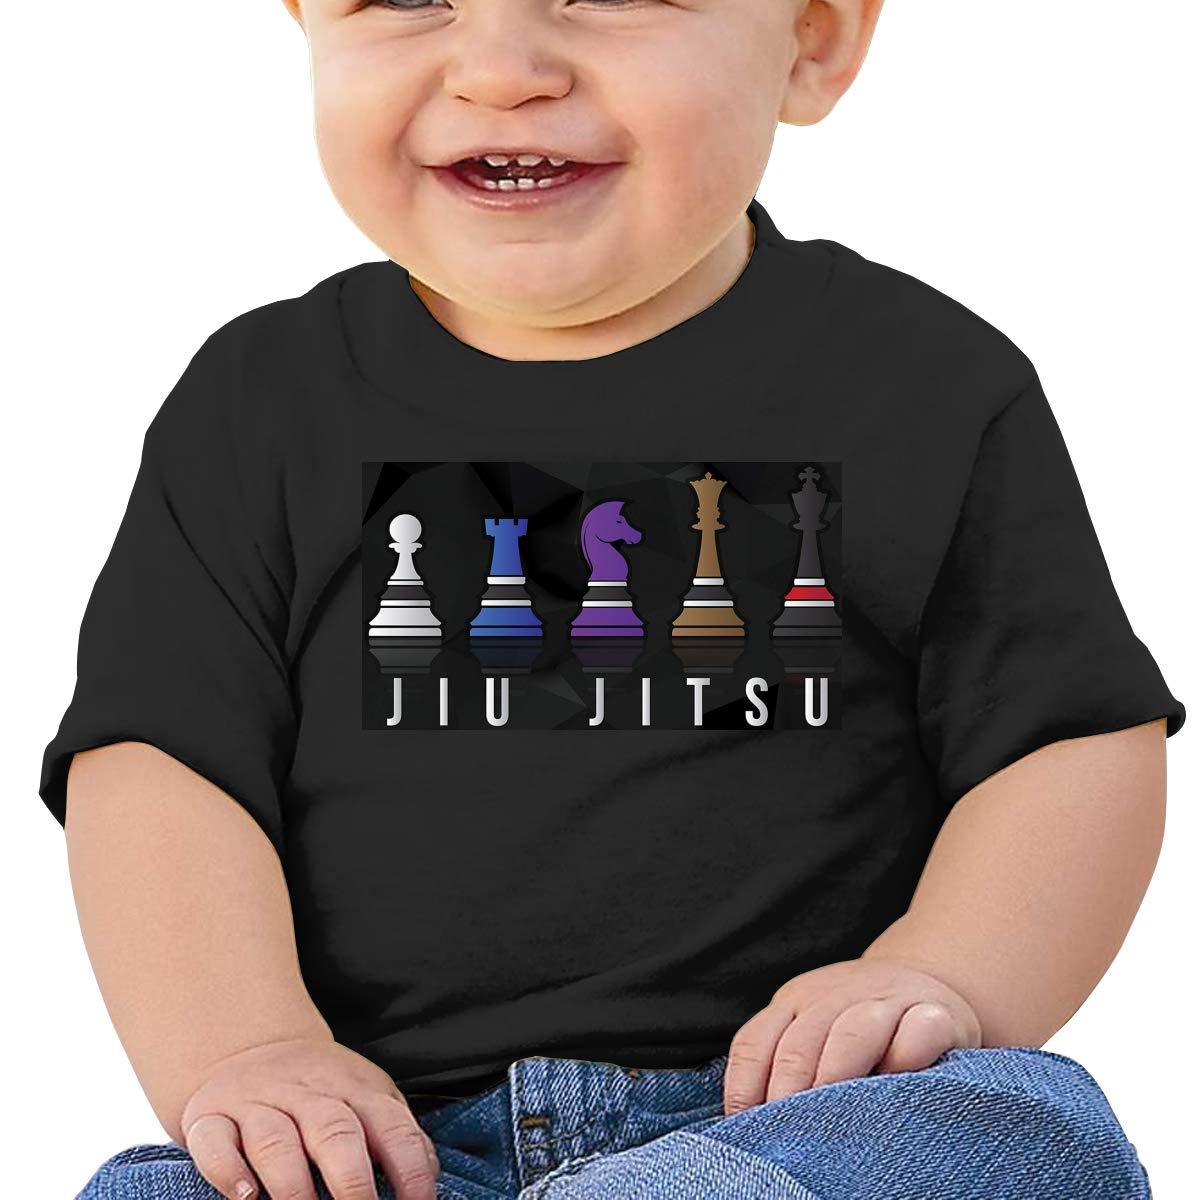 JVNSS Jiu-Jitsu Chess Baby T-Shirt Little Baby Cotton T Shirts Soft Cotton Tops for 6M-2T Baby